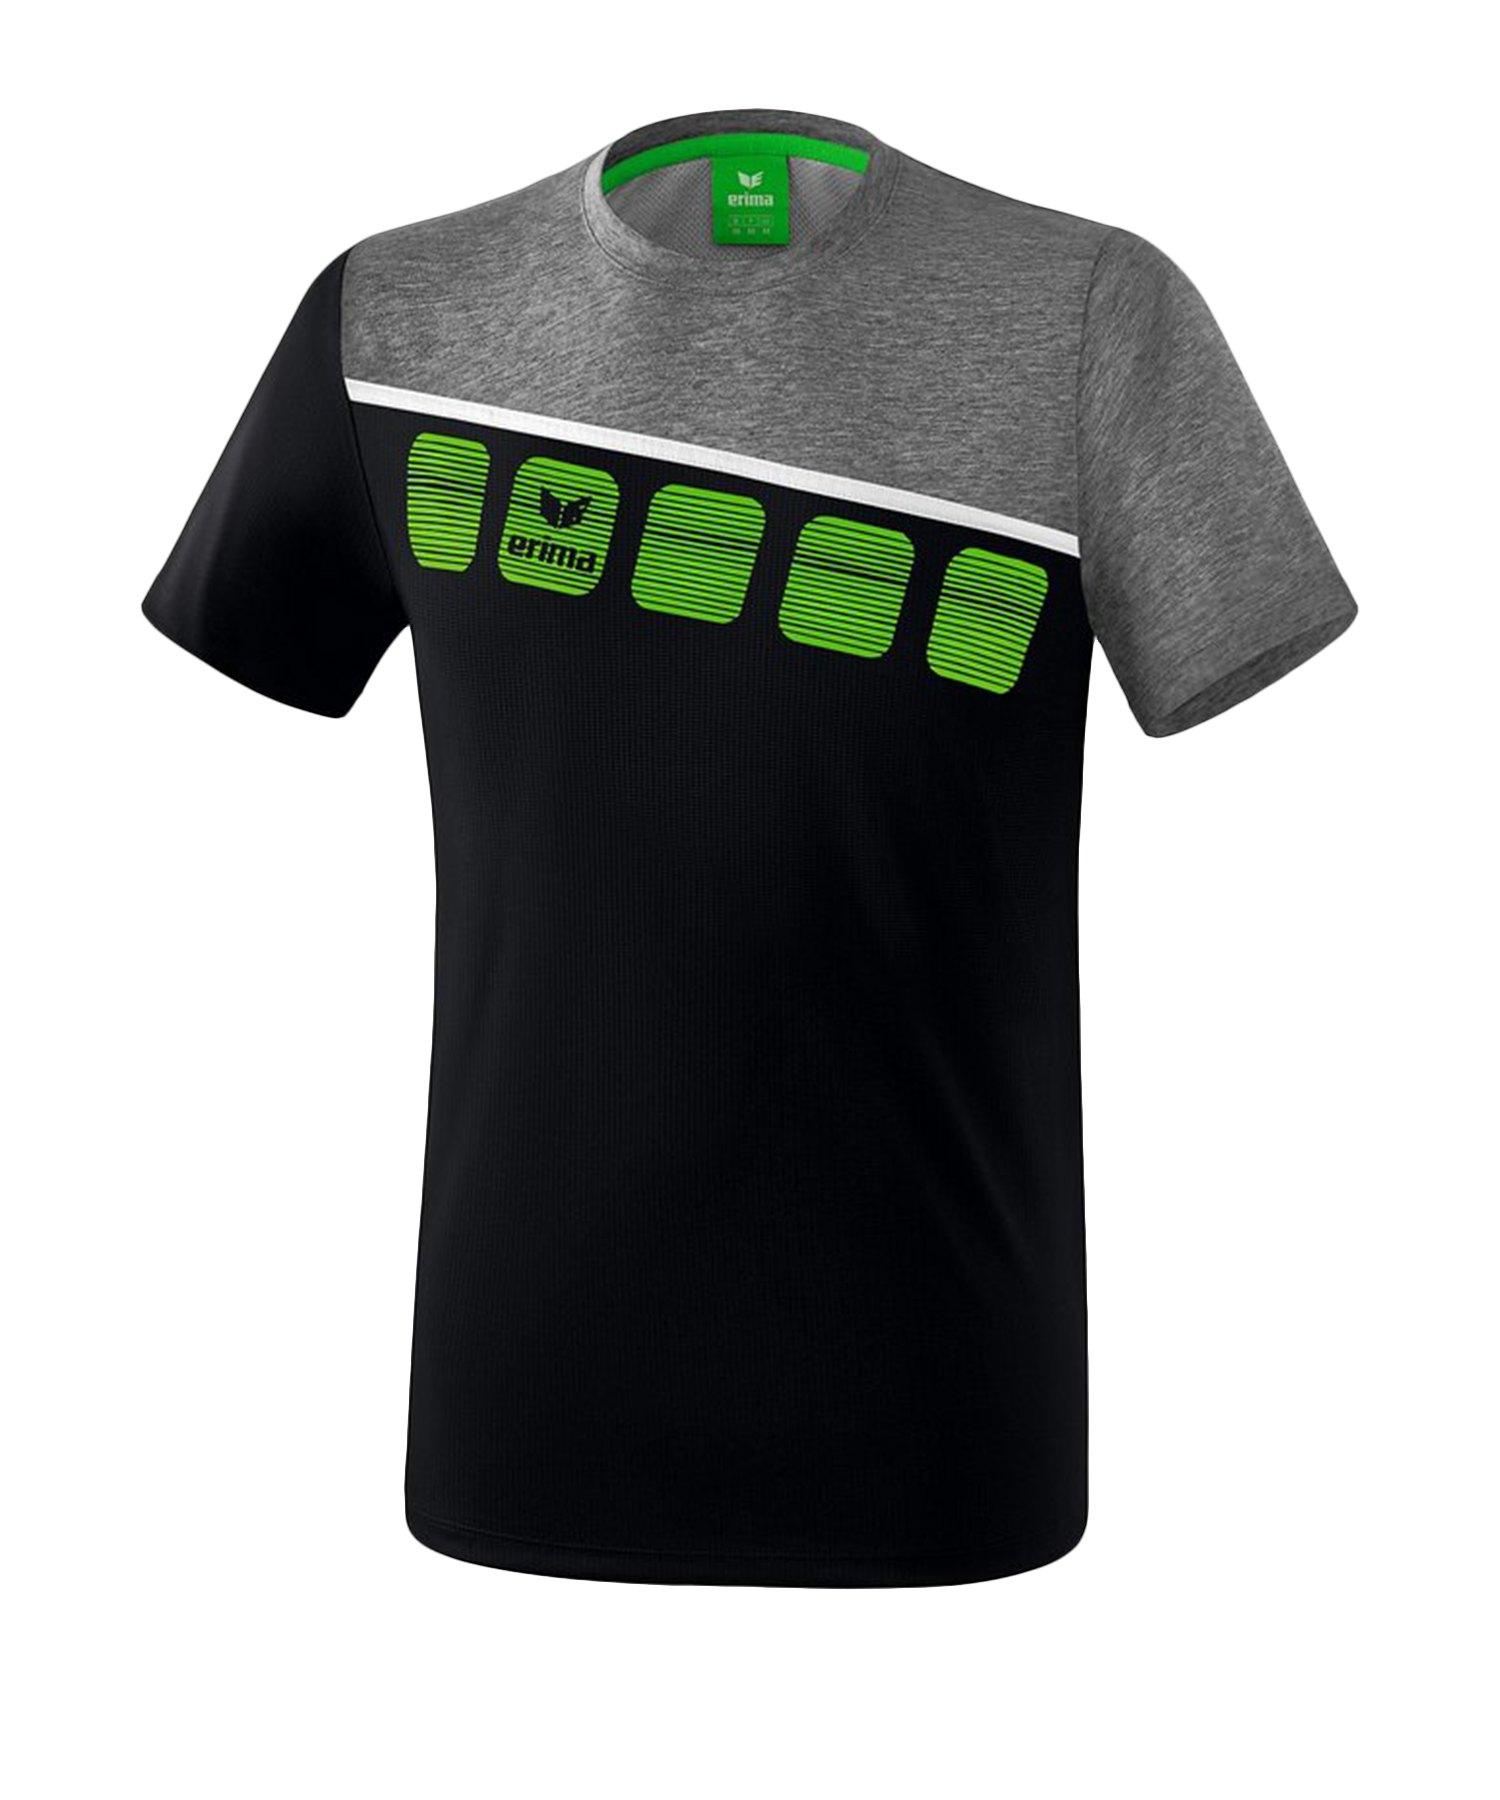 Erima 5-C T-Shirt Kids Schwarz Grau - Schwarz